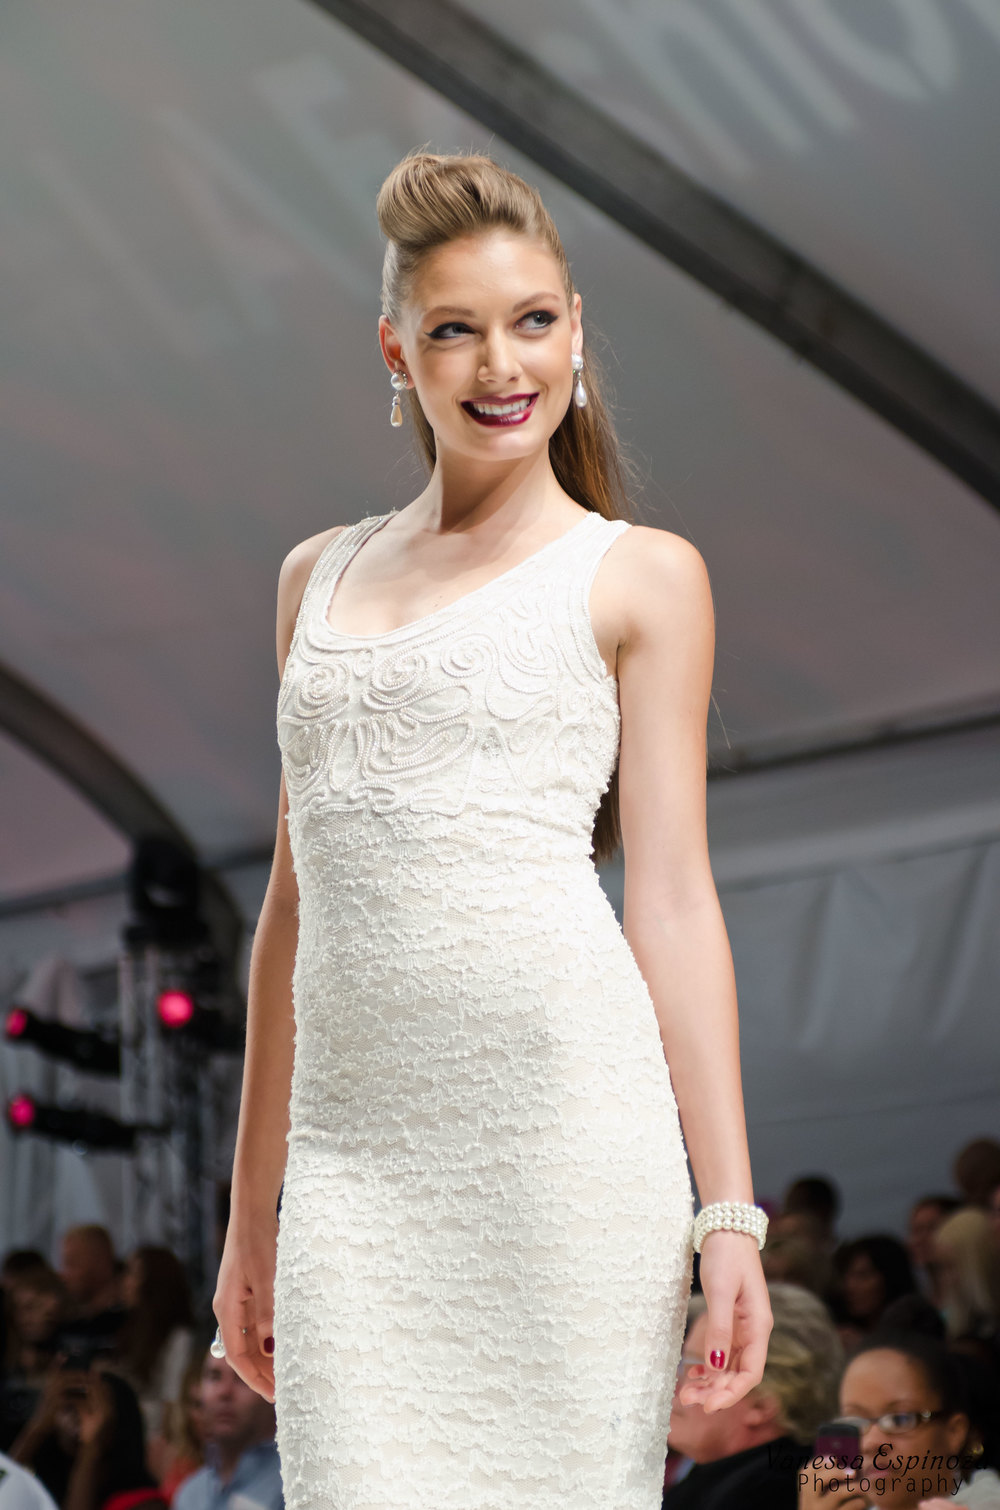 LA Fashion Weekend 2012: Nathanaelle Couture